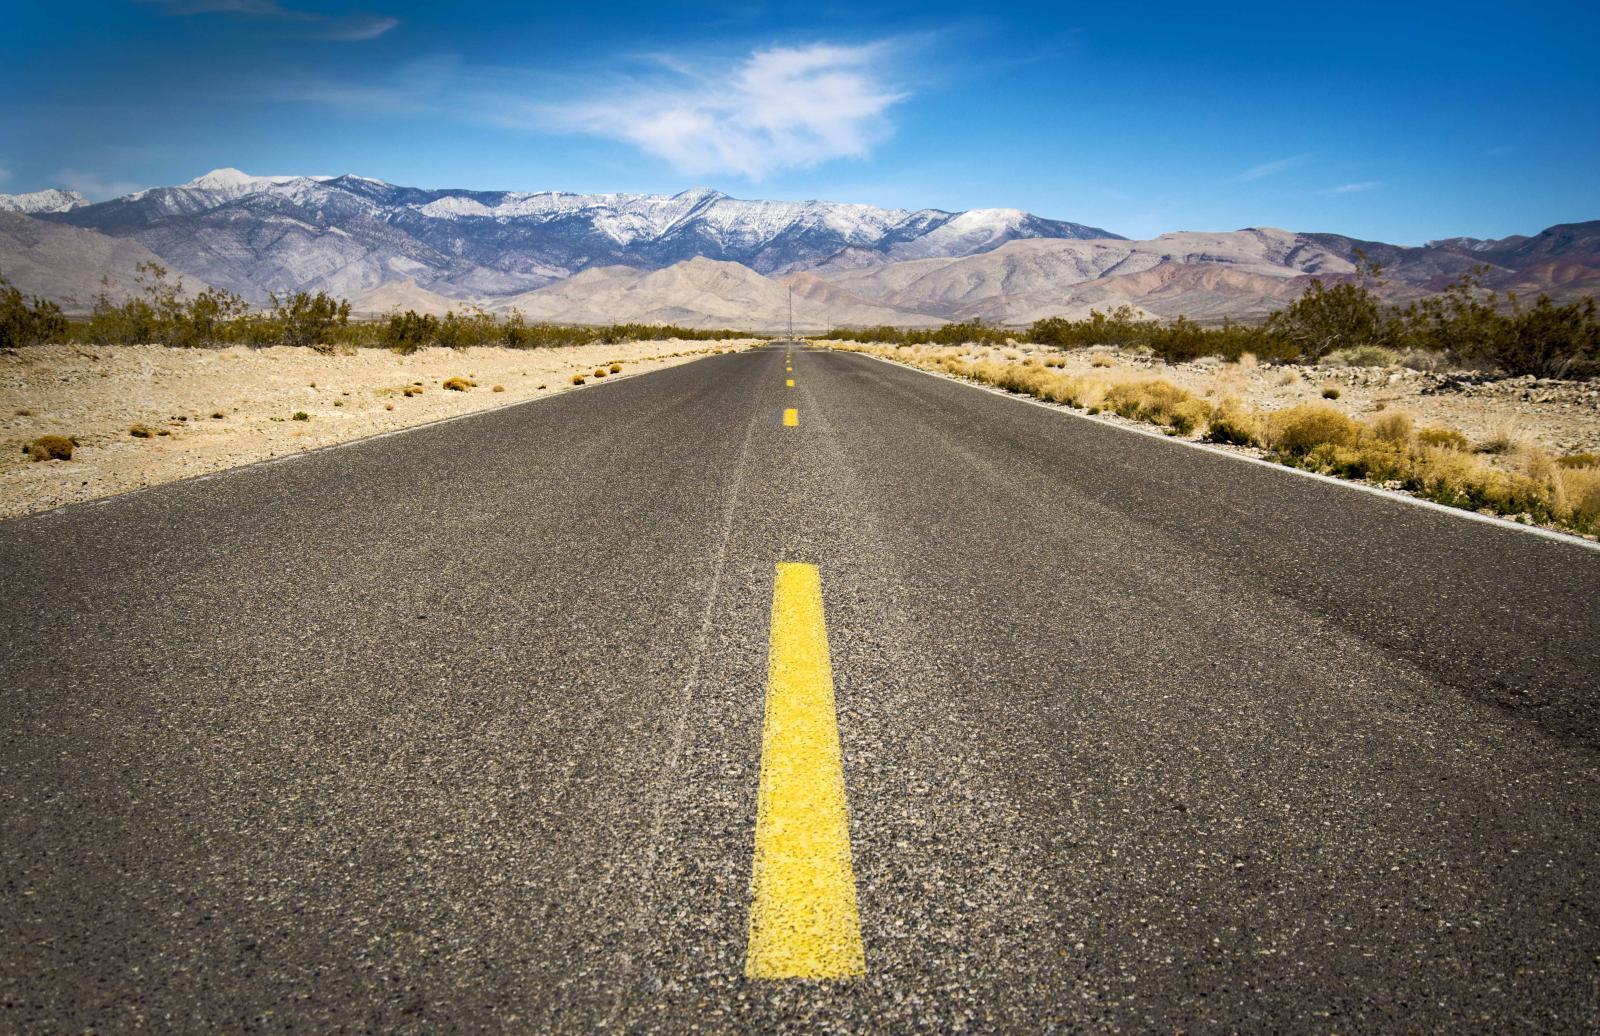 The Bianchi Law Group's Joyful Journey Program